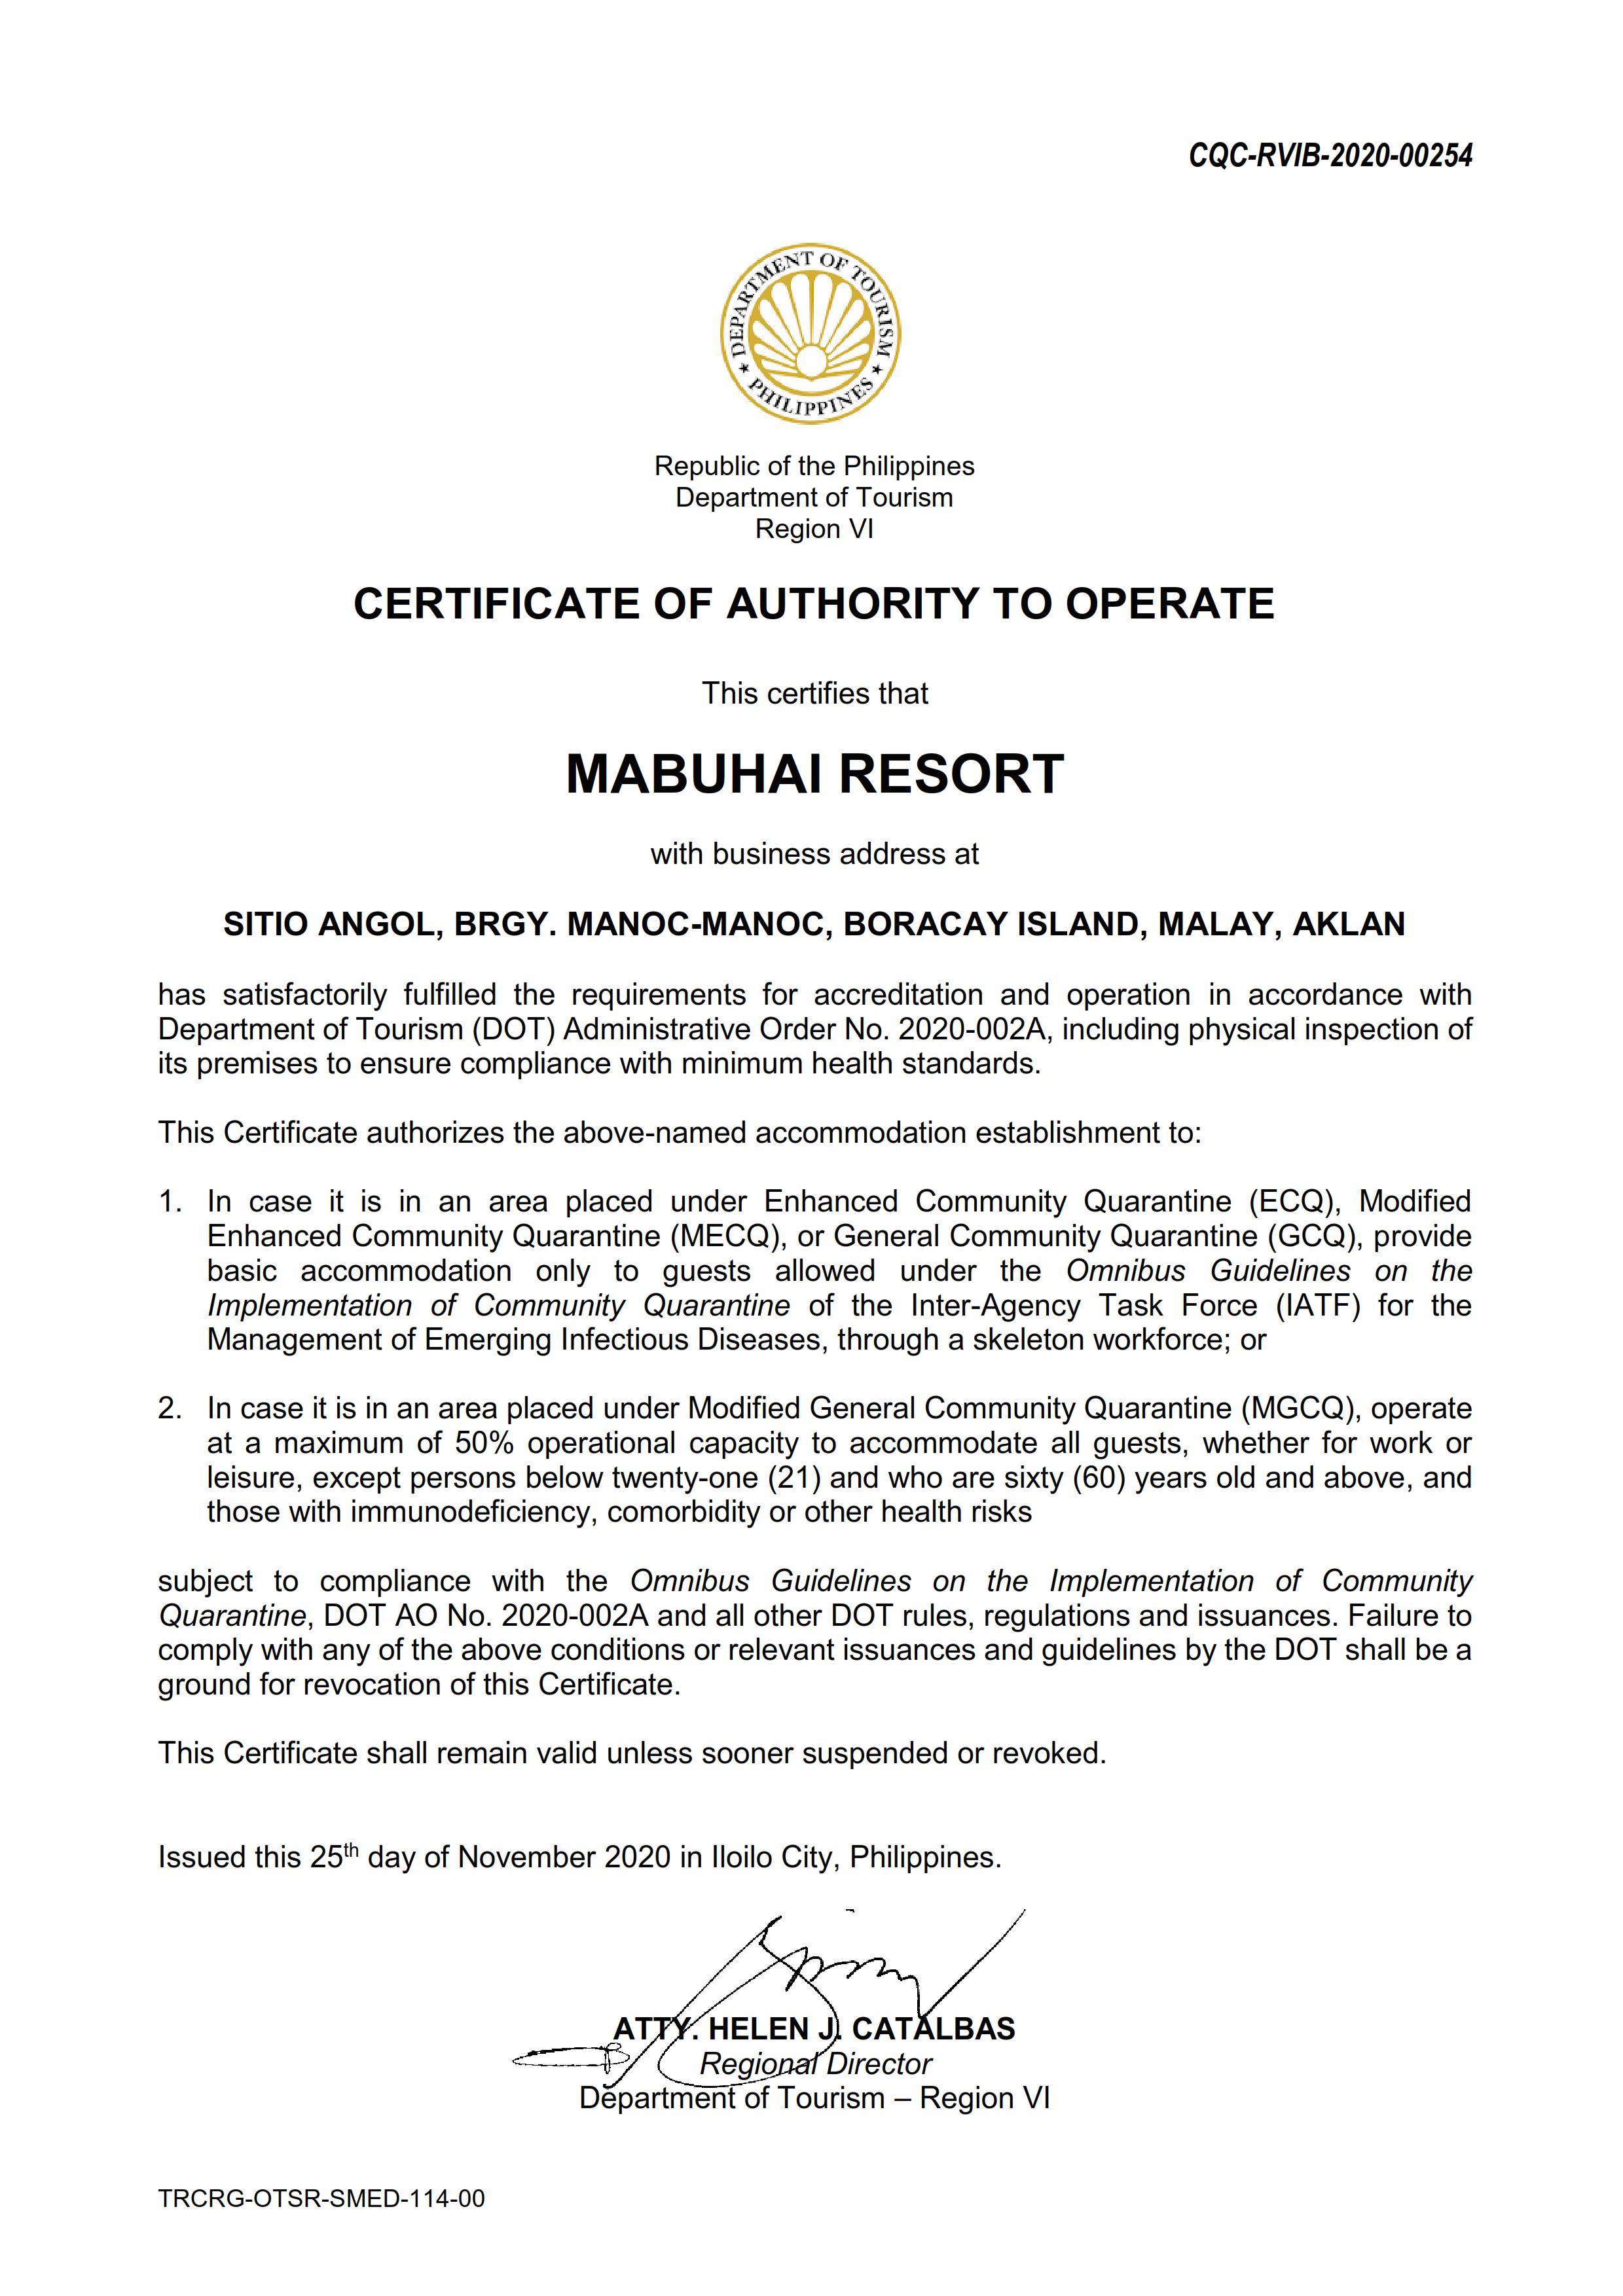 Mabuhay Certificate